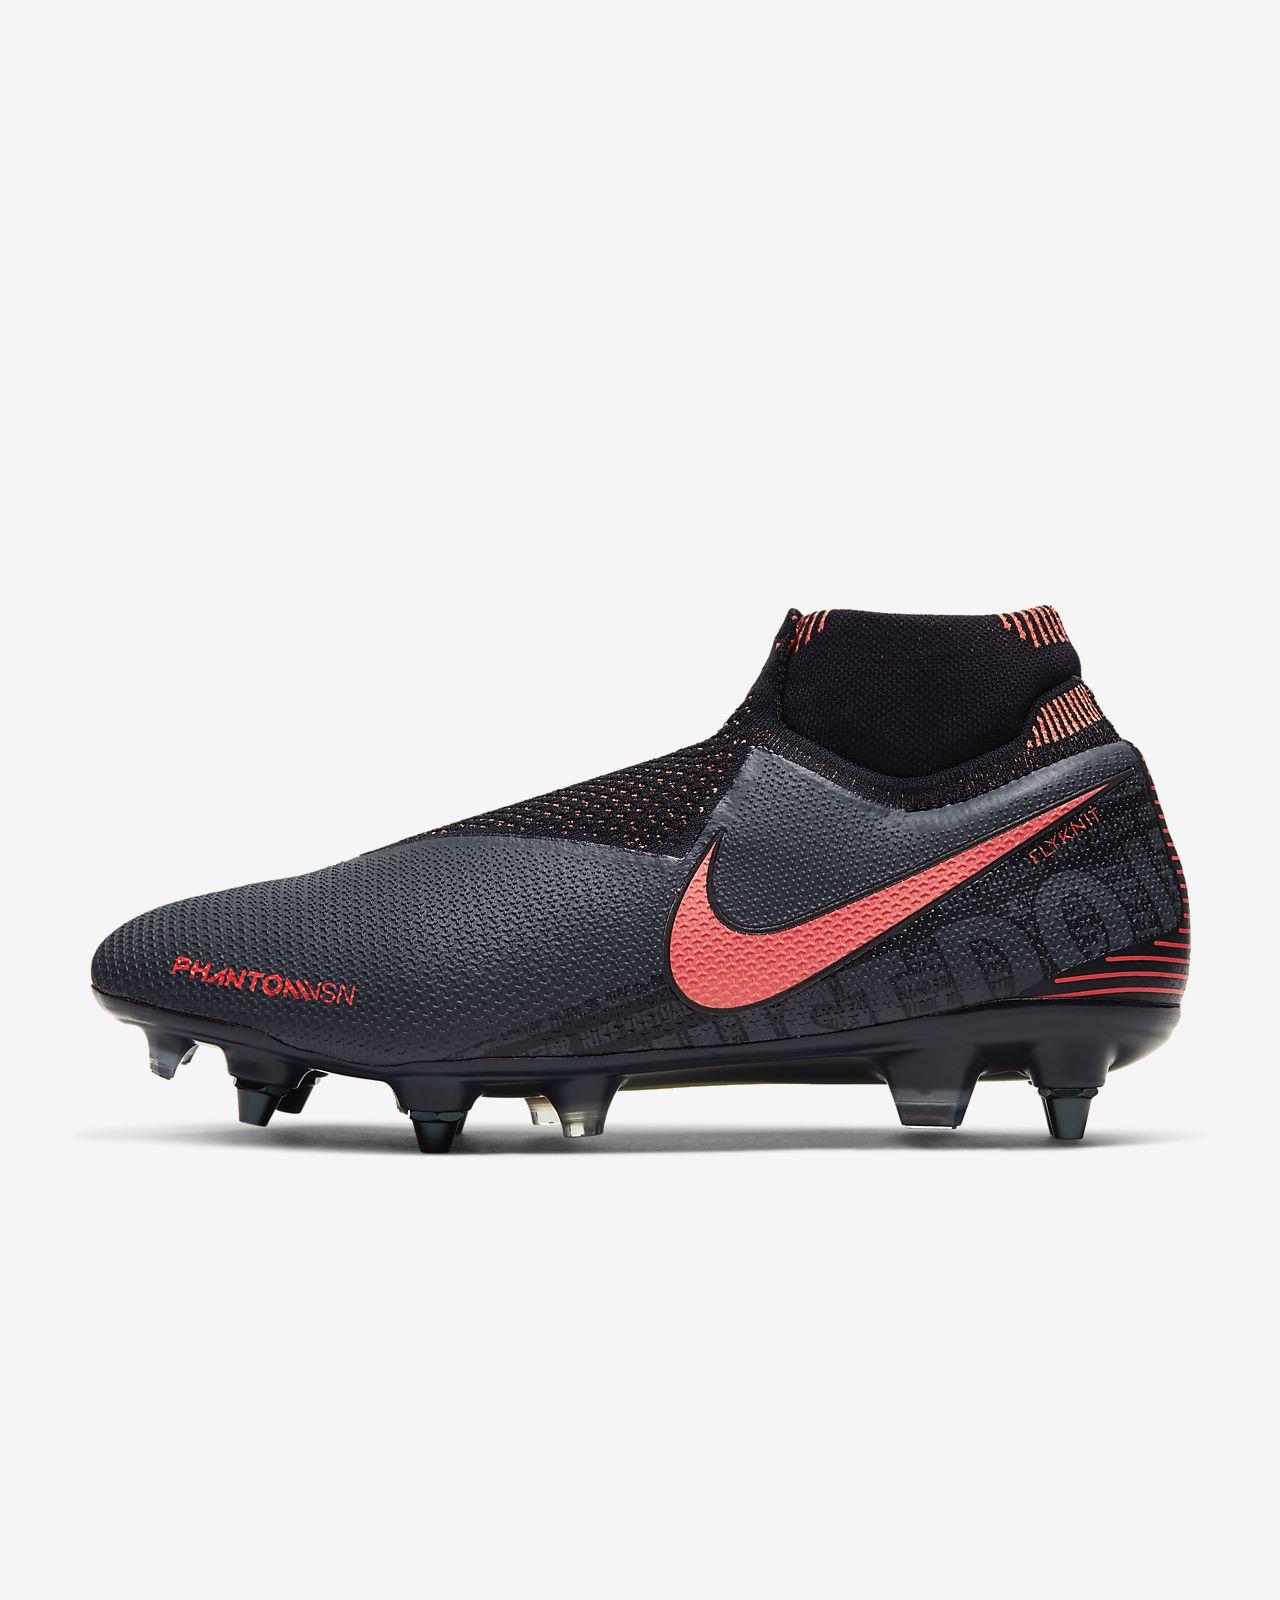 Nike Phantom VSN Academy Dynamic Fit MG Voetbalschoenen M